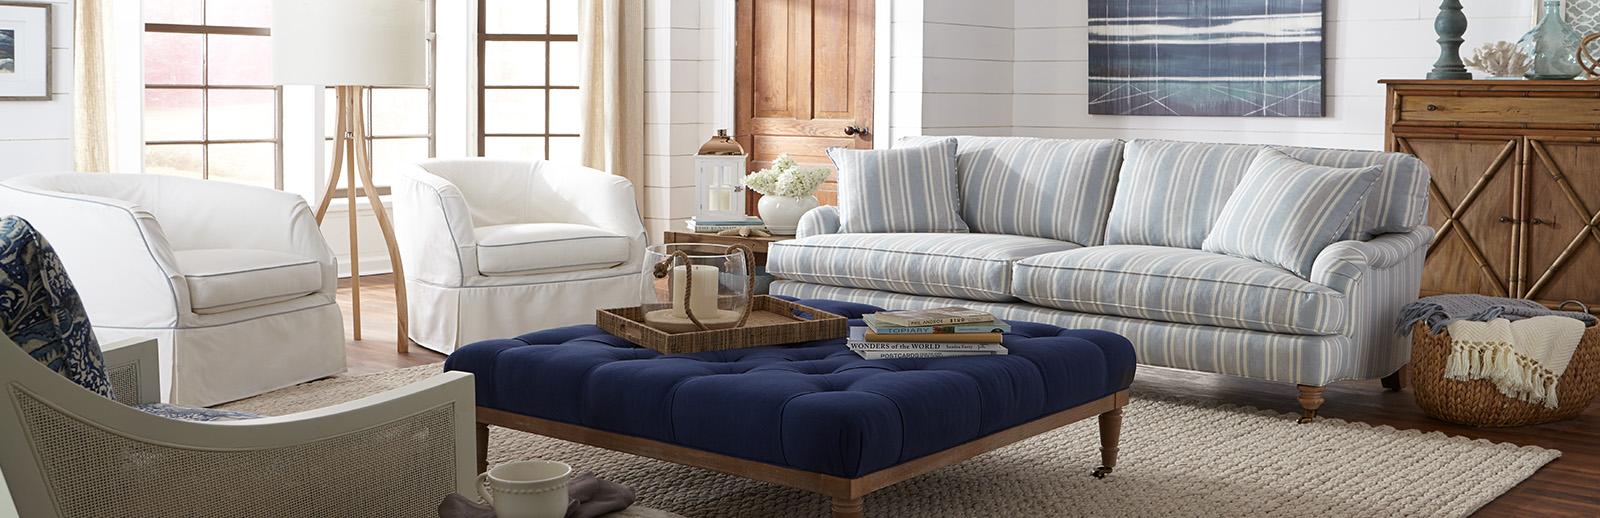 Charmant Hucks And Washington | Furniture Store | Conway SC